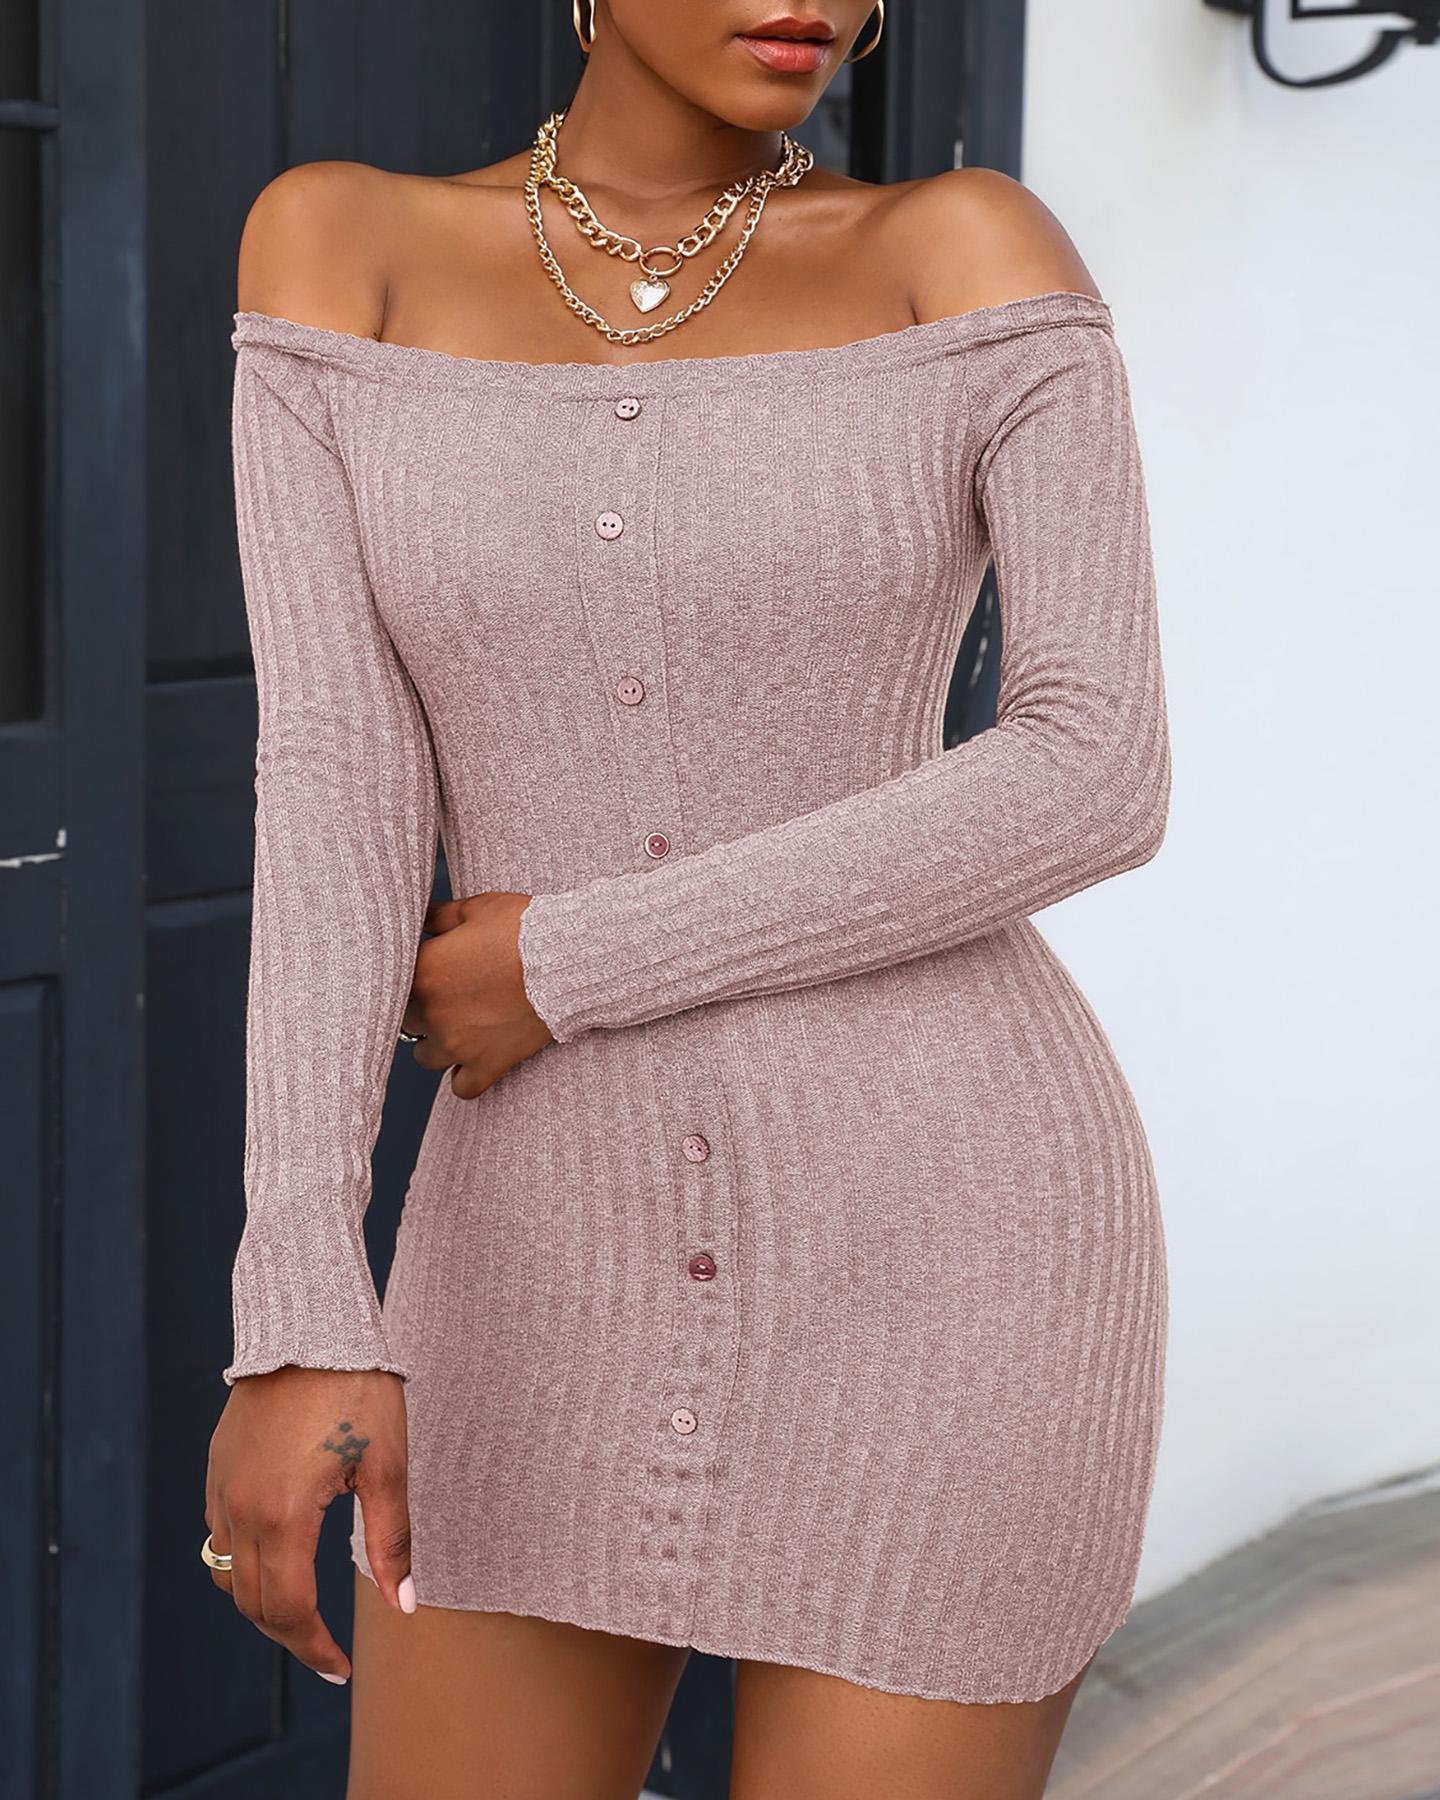 chicme / Button Design Off Shoulder Knit Bodycon Dress